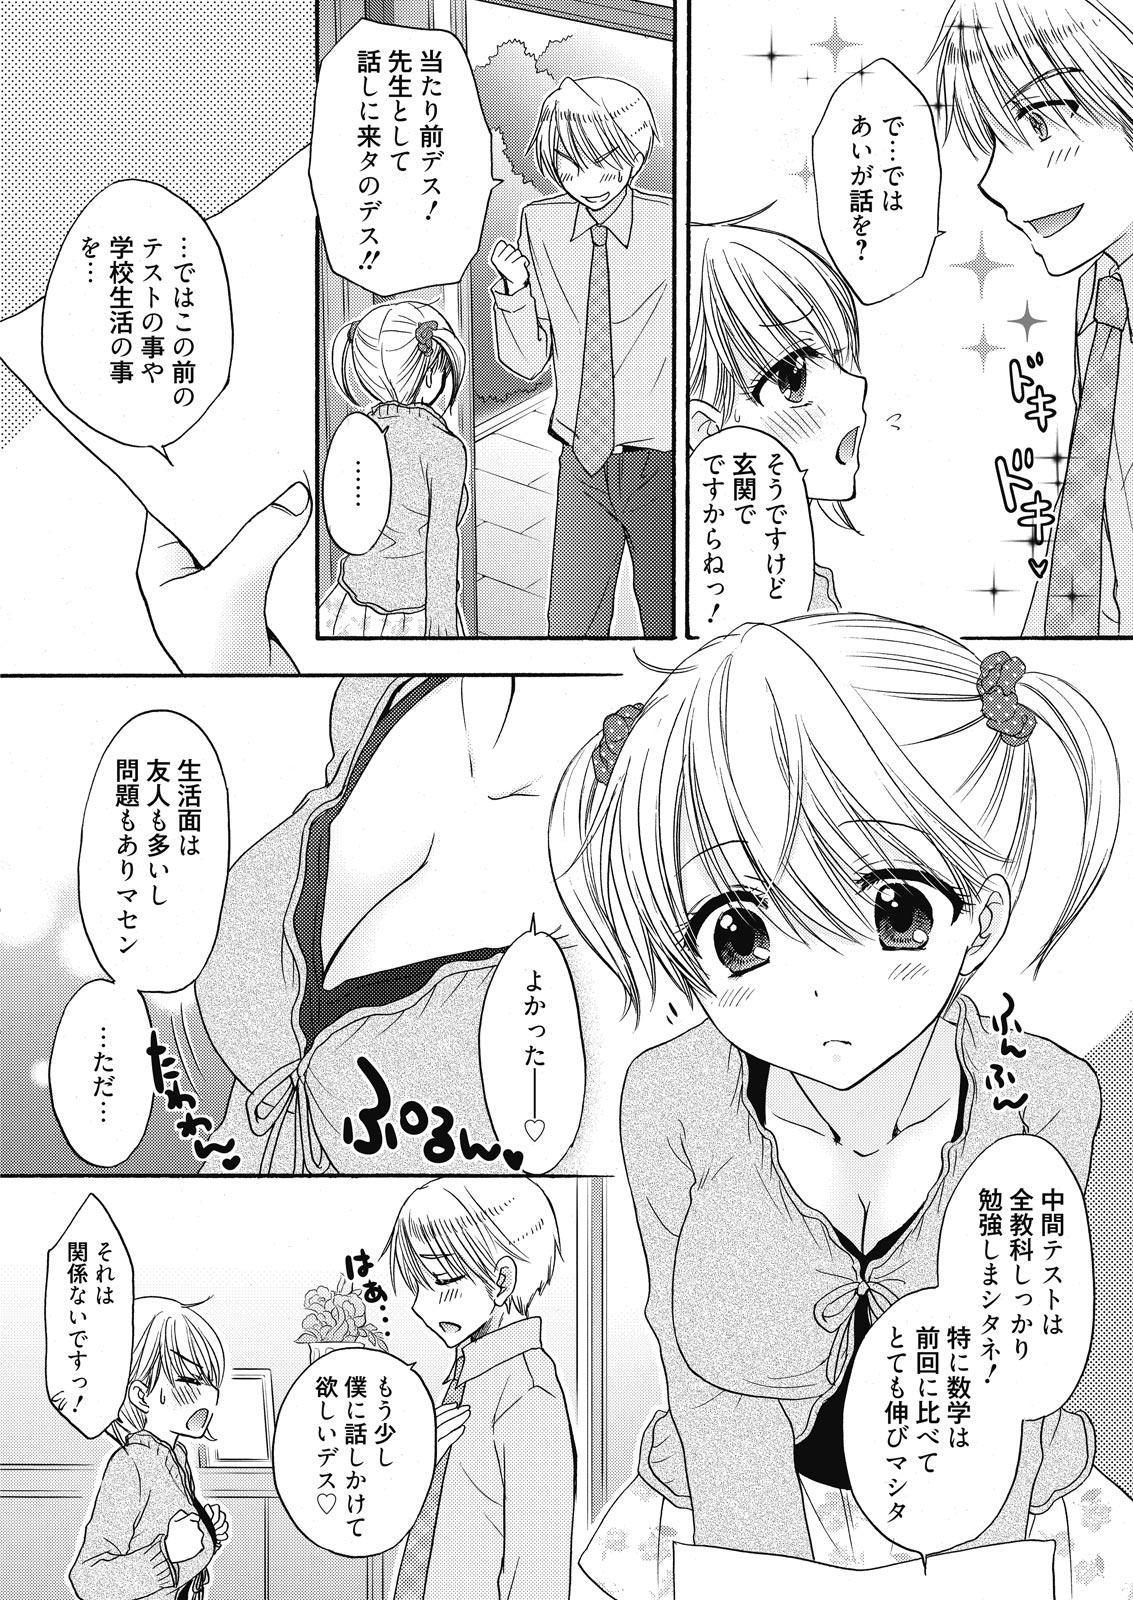 Web Manga Bangaichi Vol. 7 31